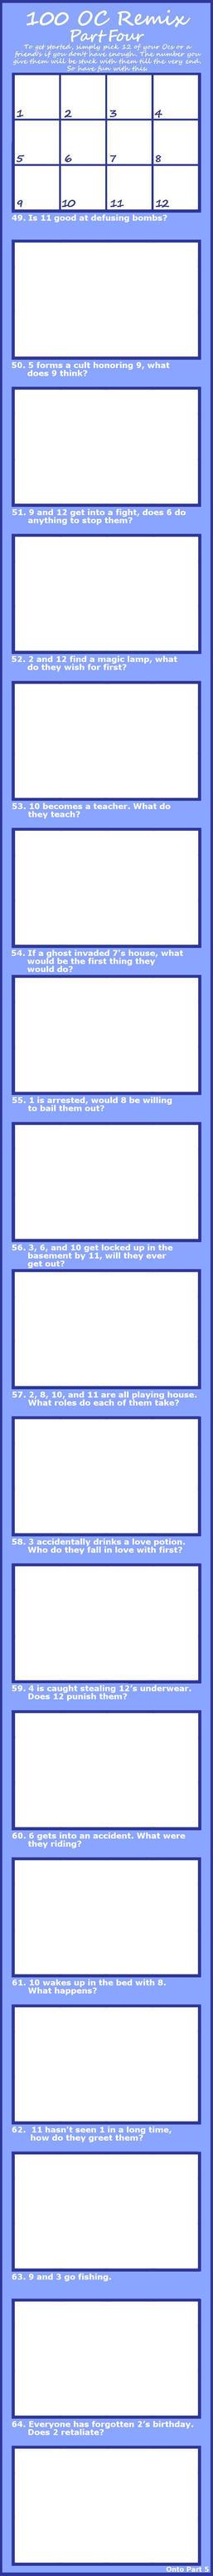 100-OC-REMIX Challenge Pt4 by Anasatcia